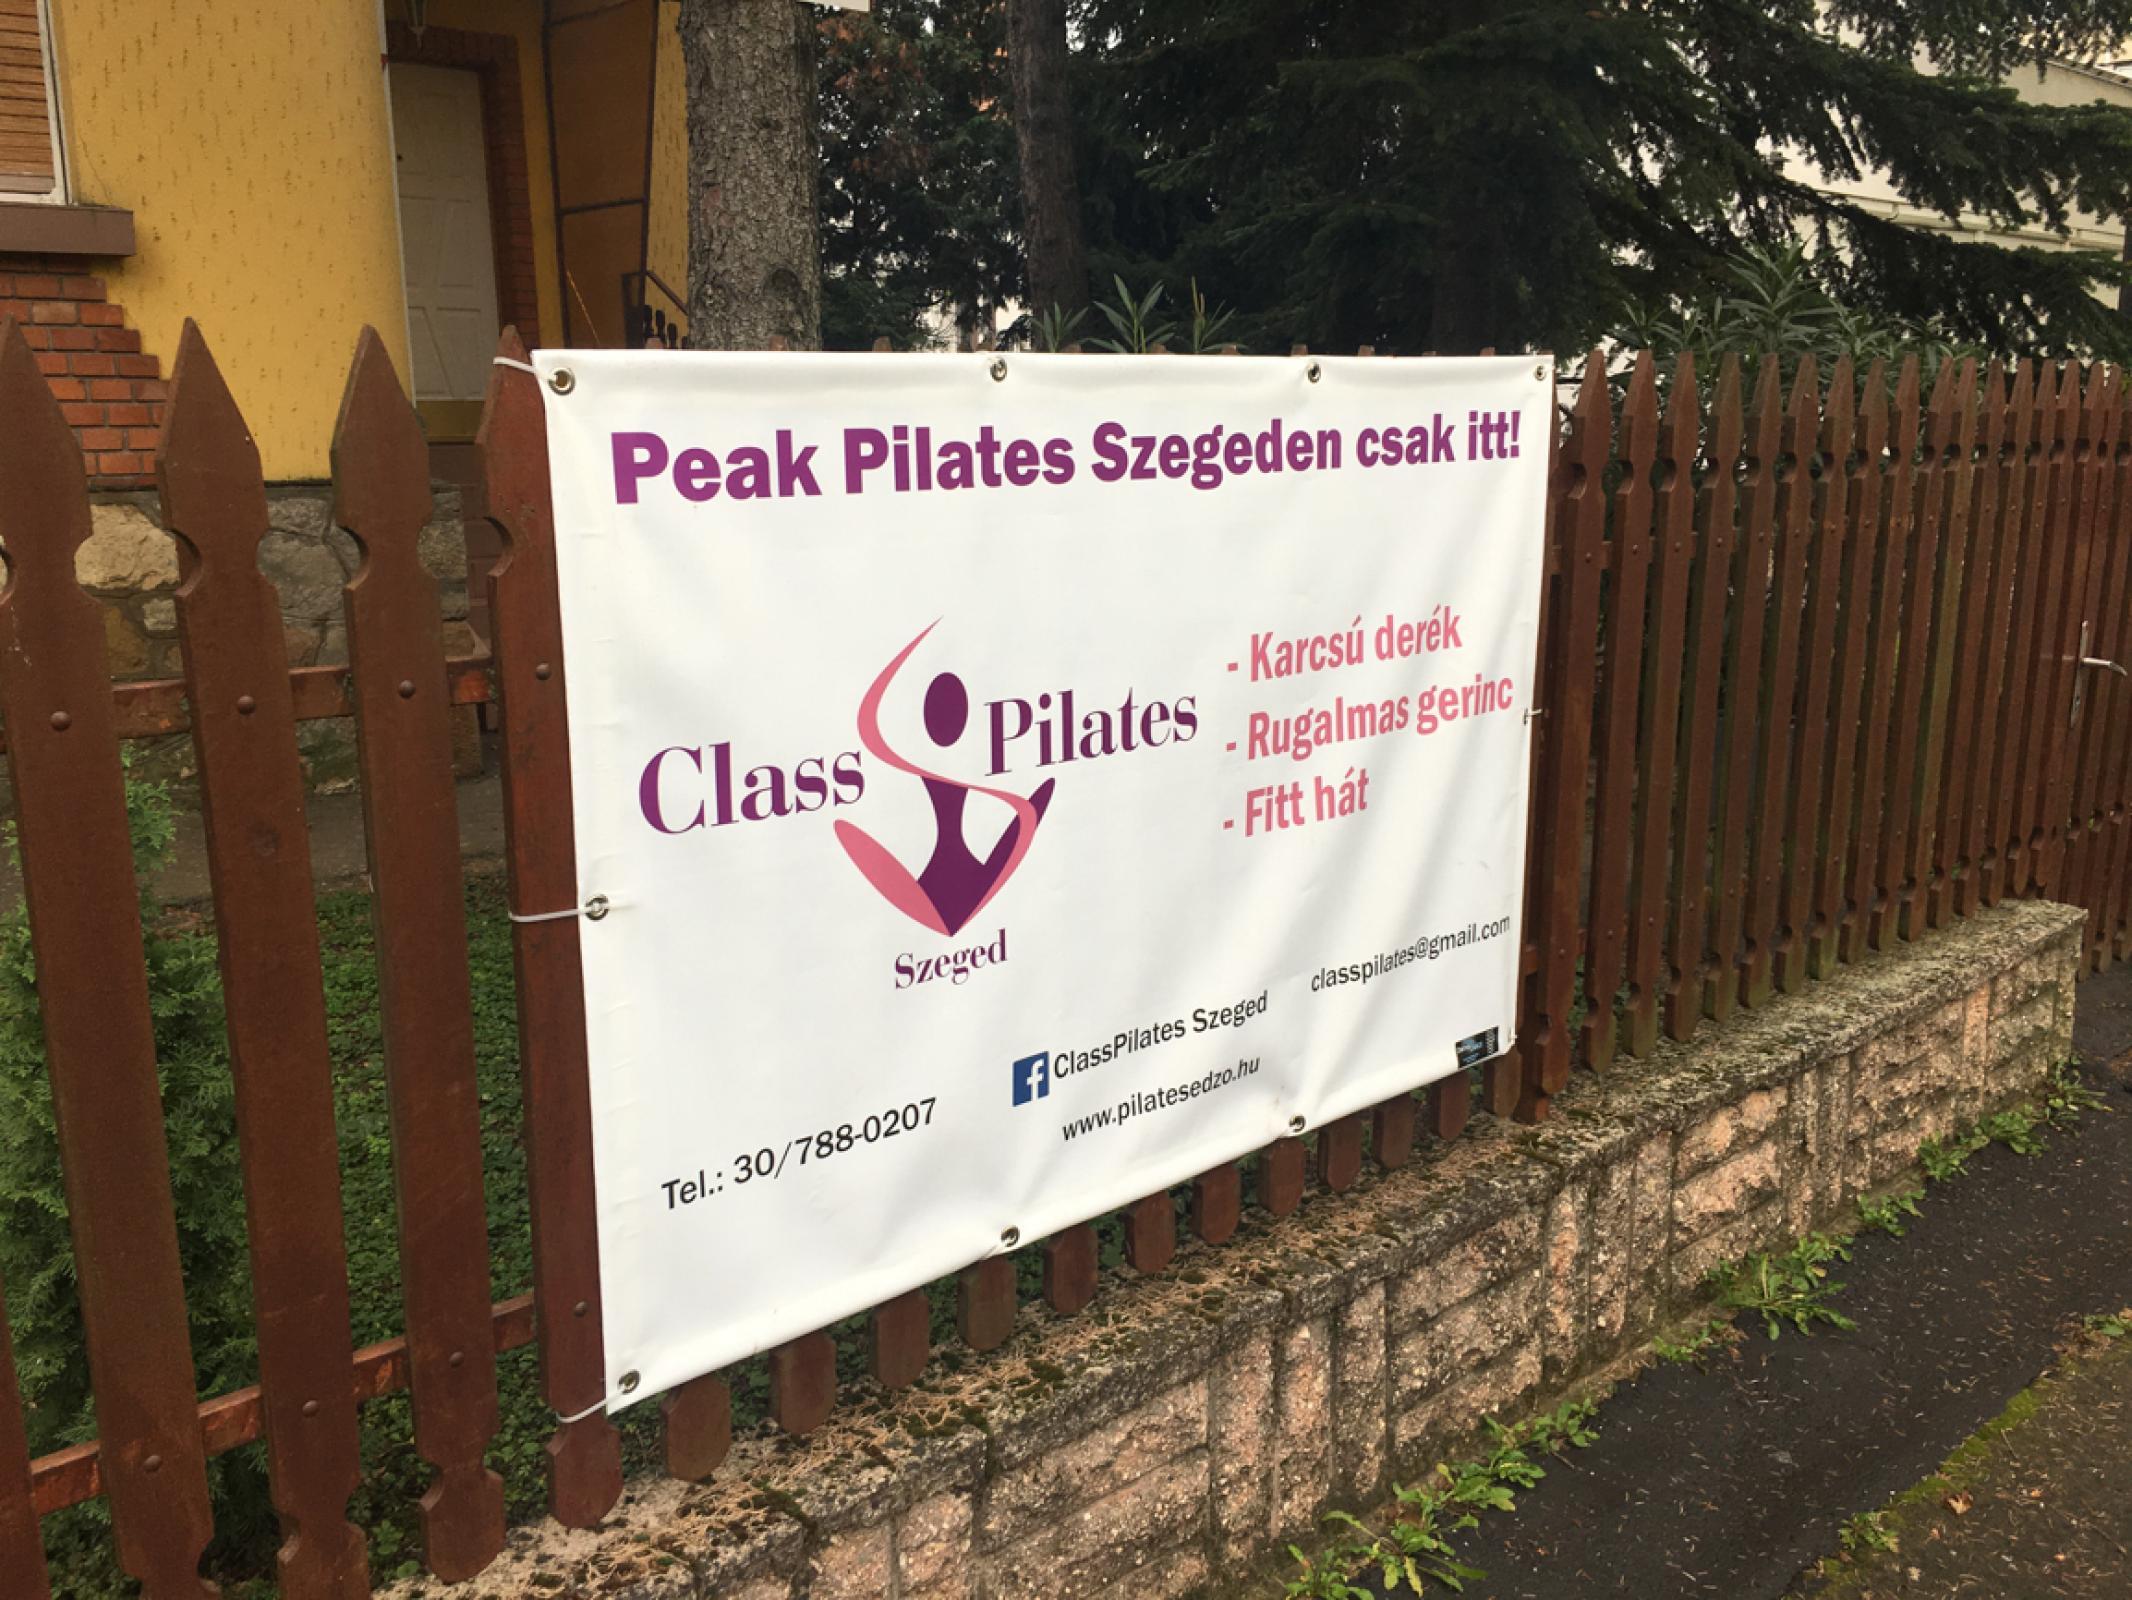 Class Pilates SZEGED